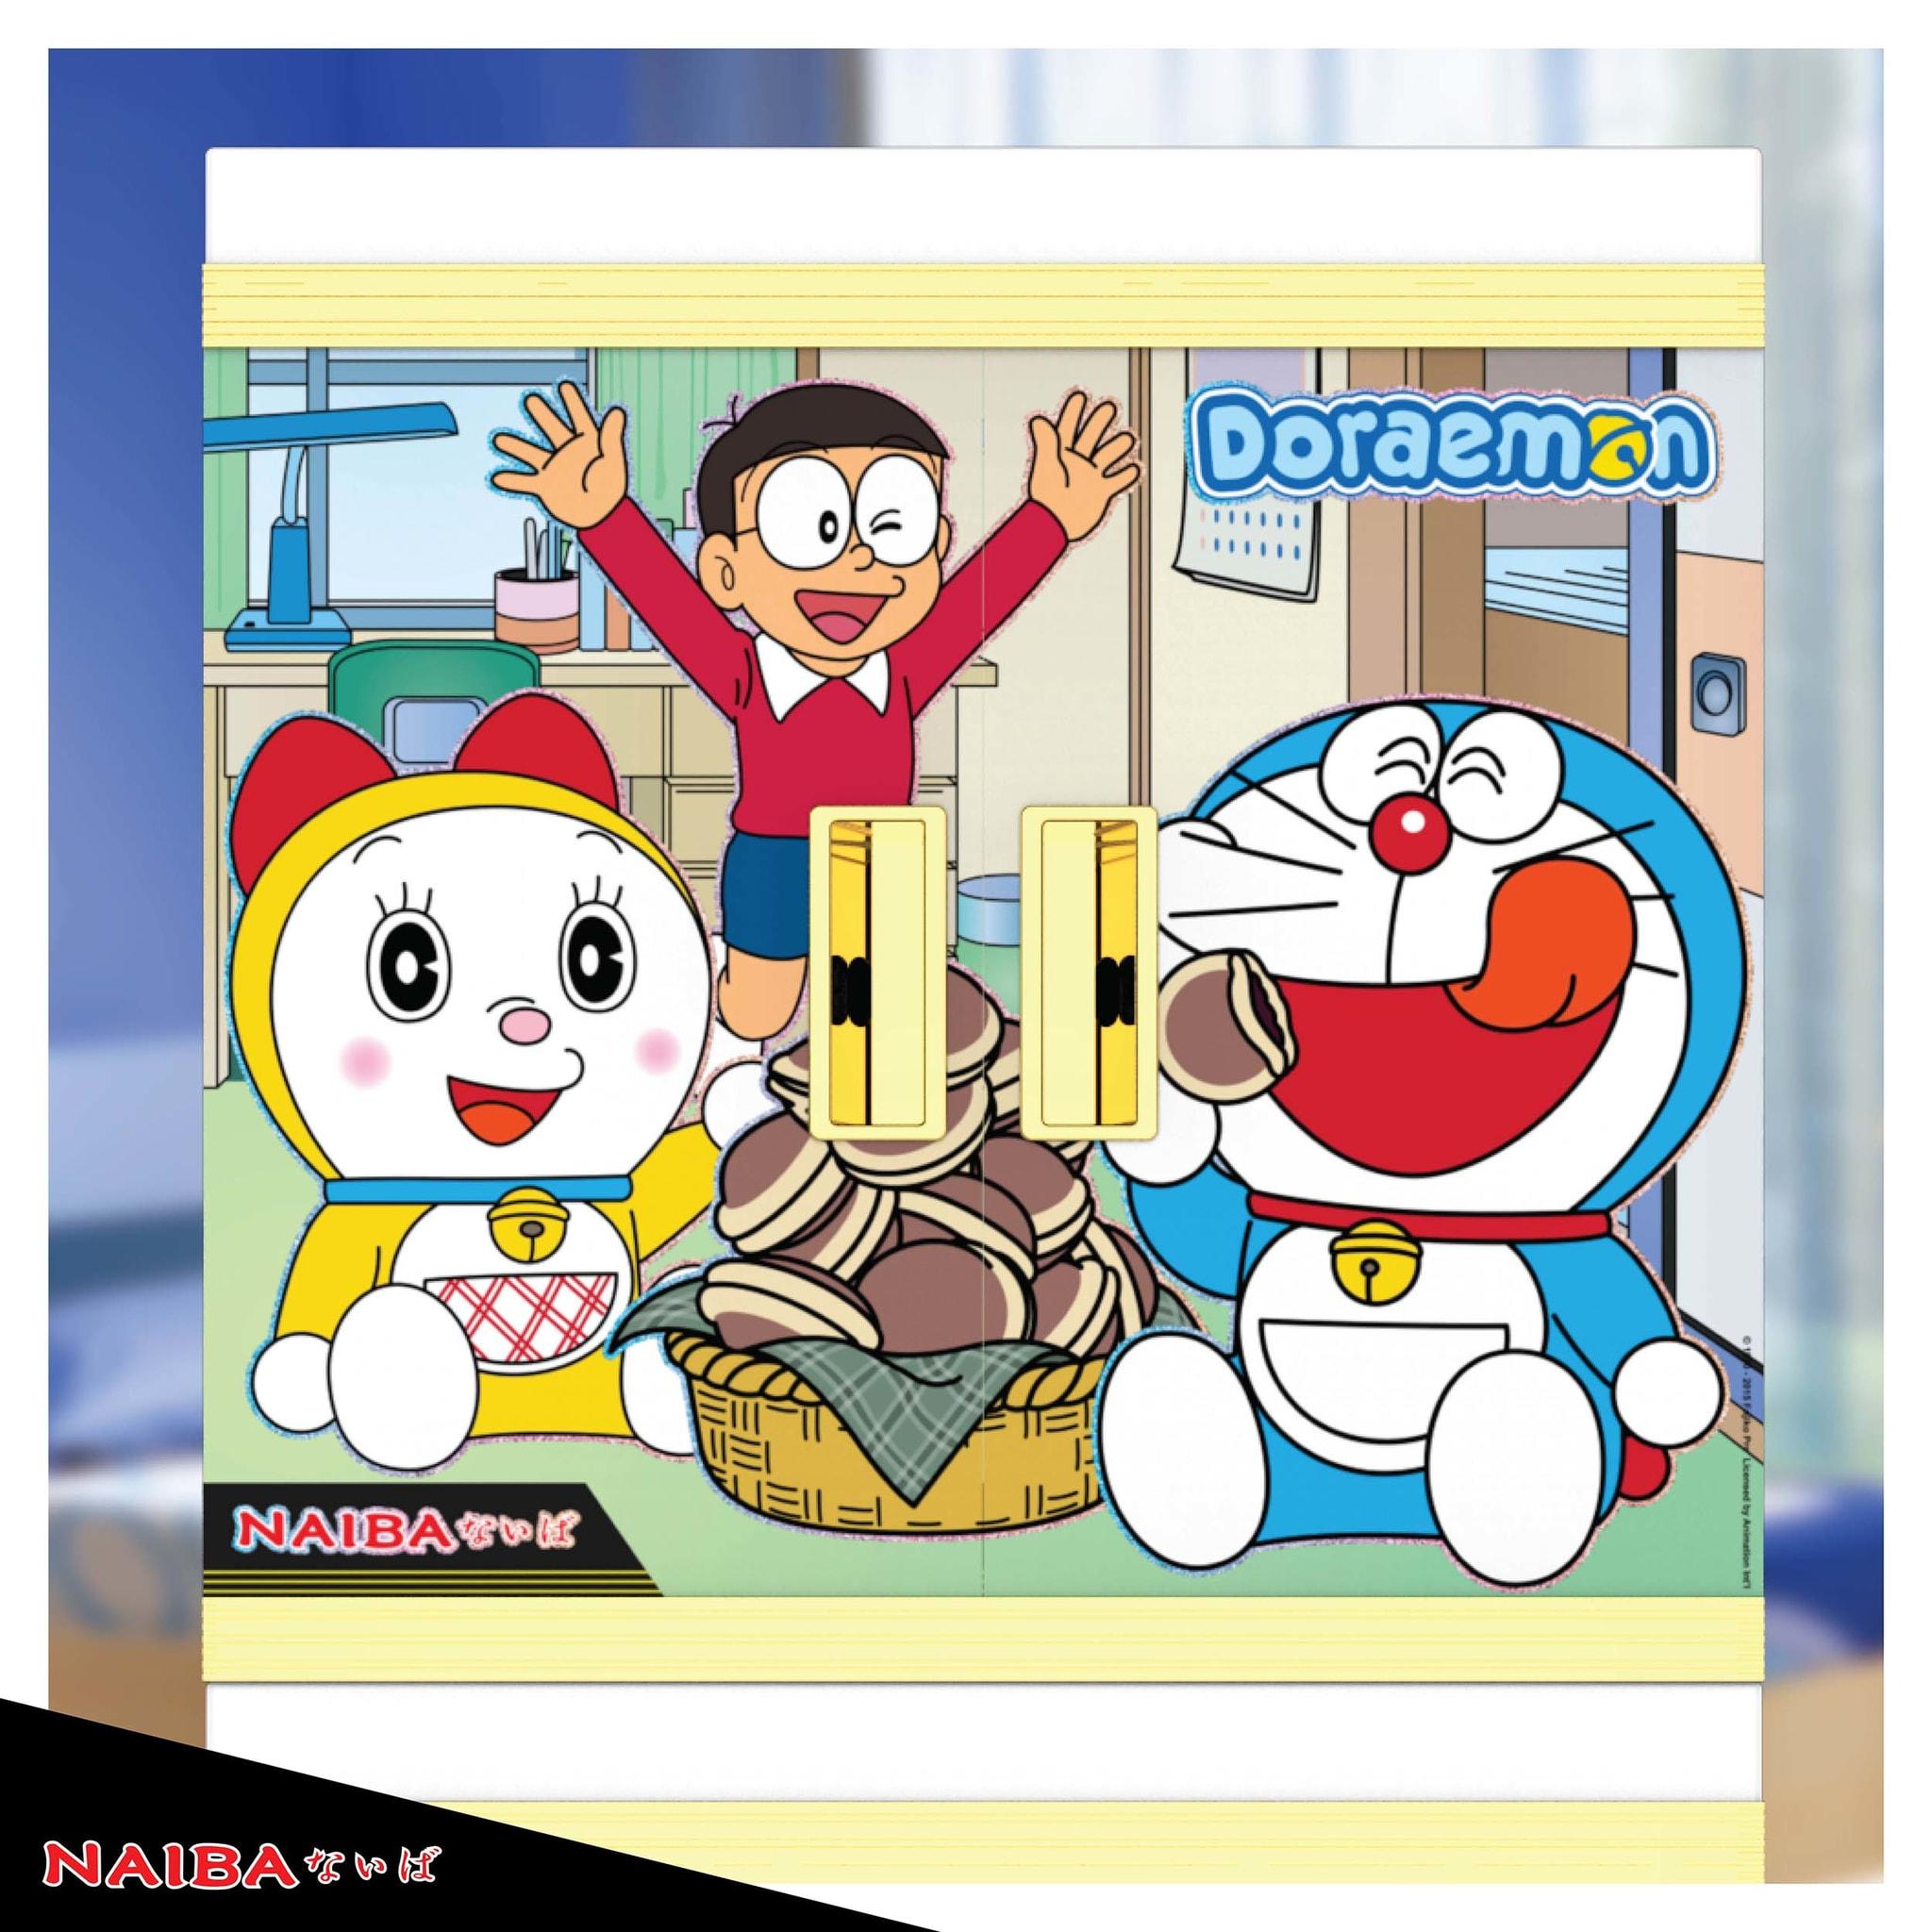 Jual Lemari Plastik - Rak Baju Naiba tipe Doraemon 4674 - Rock ...